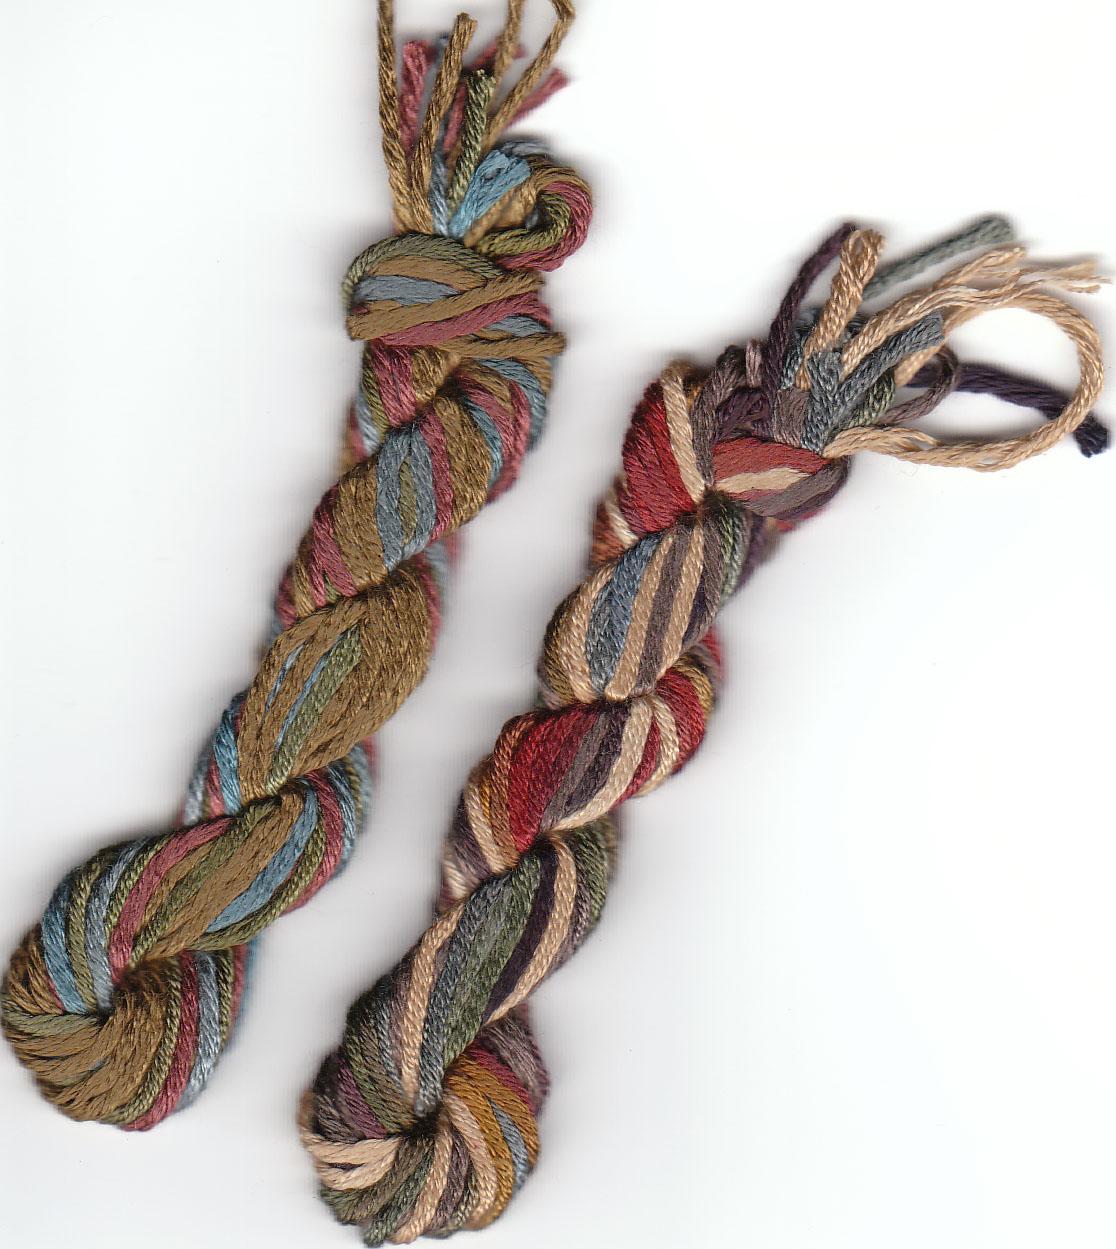 Quaker Stitches thread pack